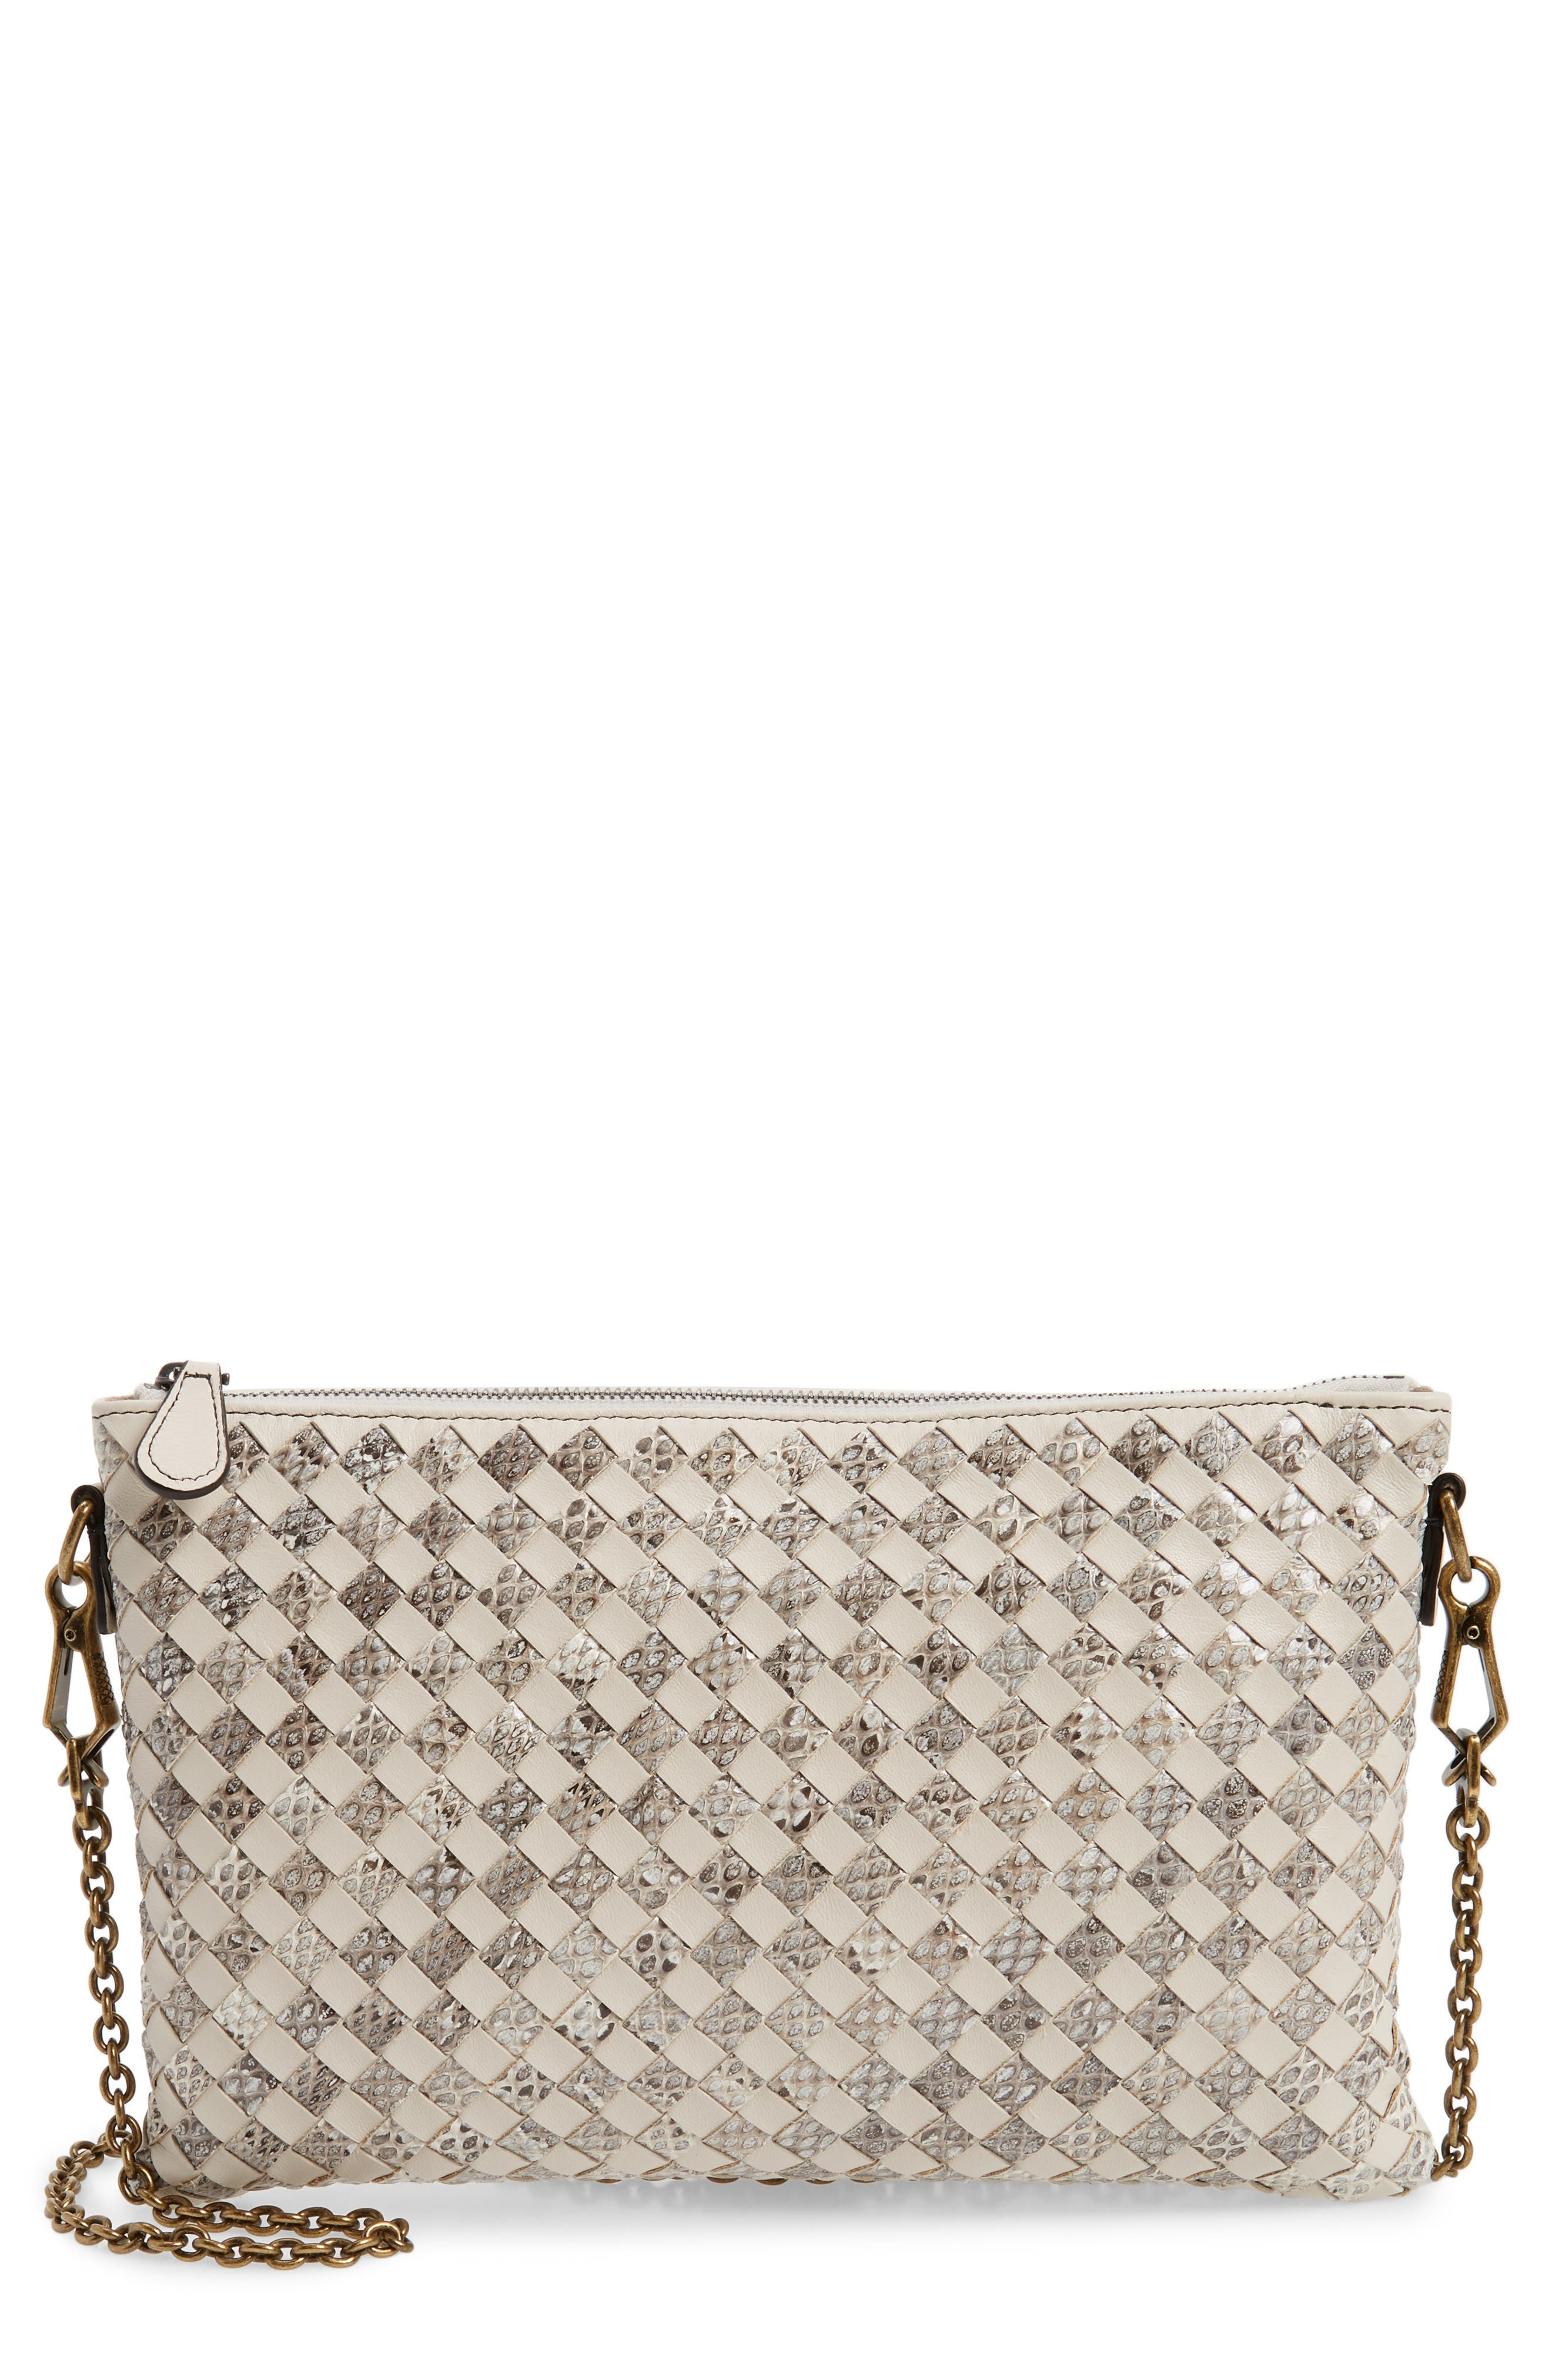 Bottega Veneta Ayers Genuine Snakeskin & Leather Crossbody Bag